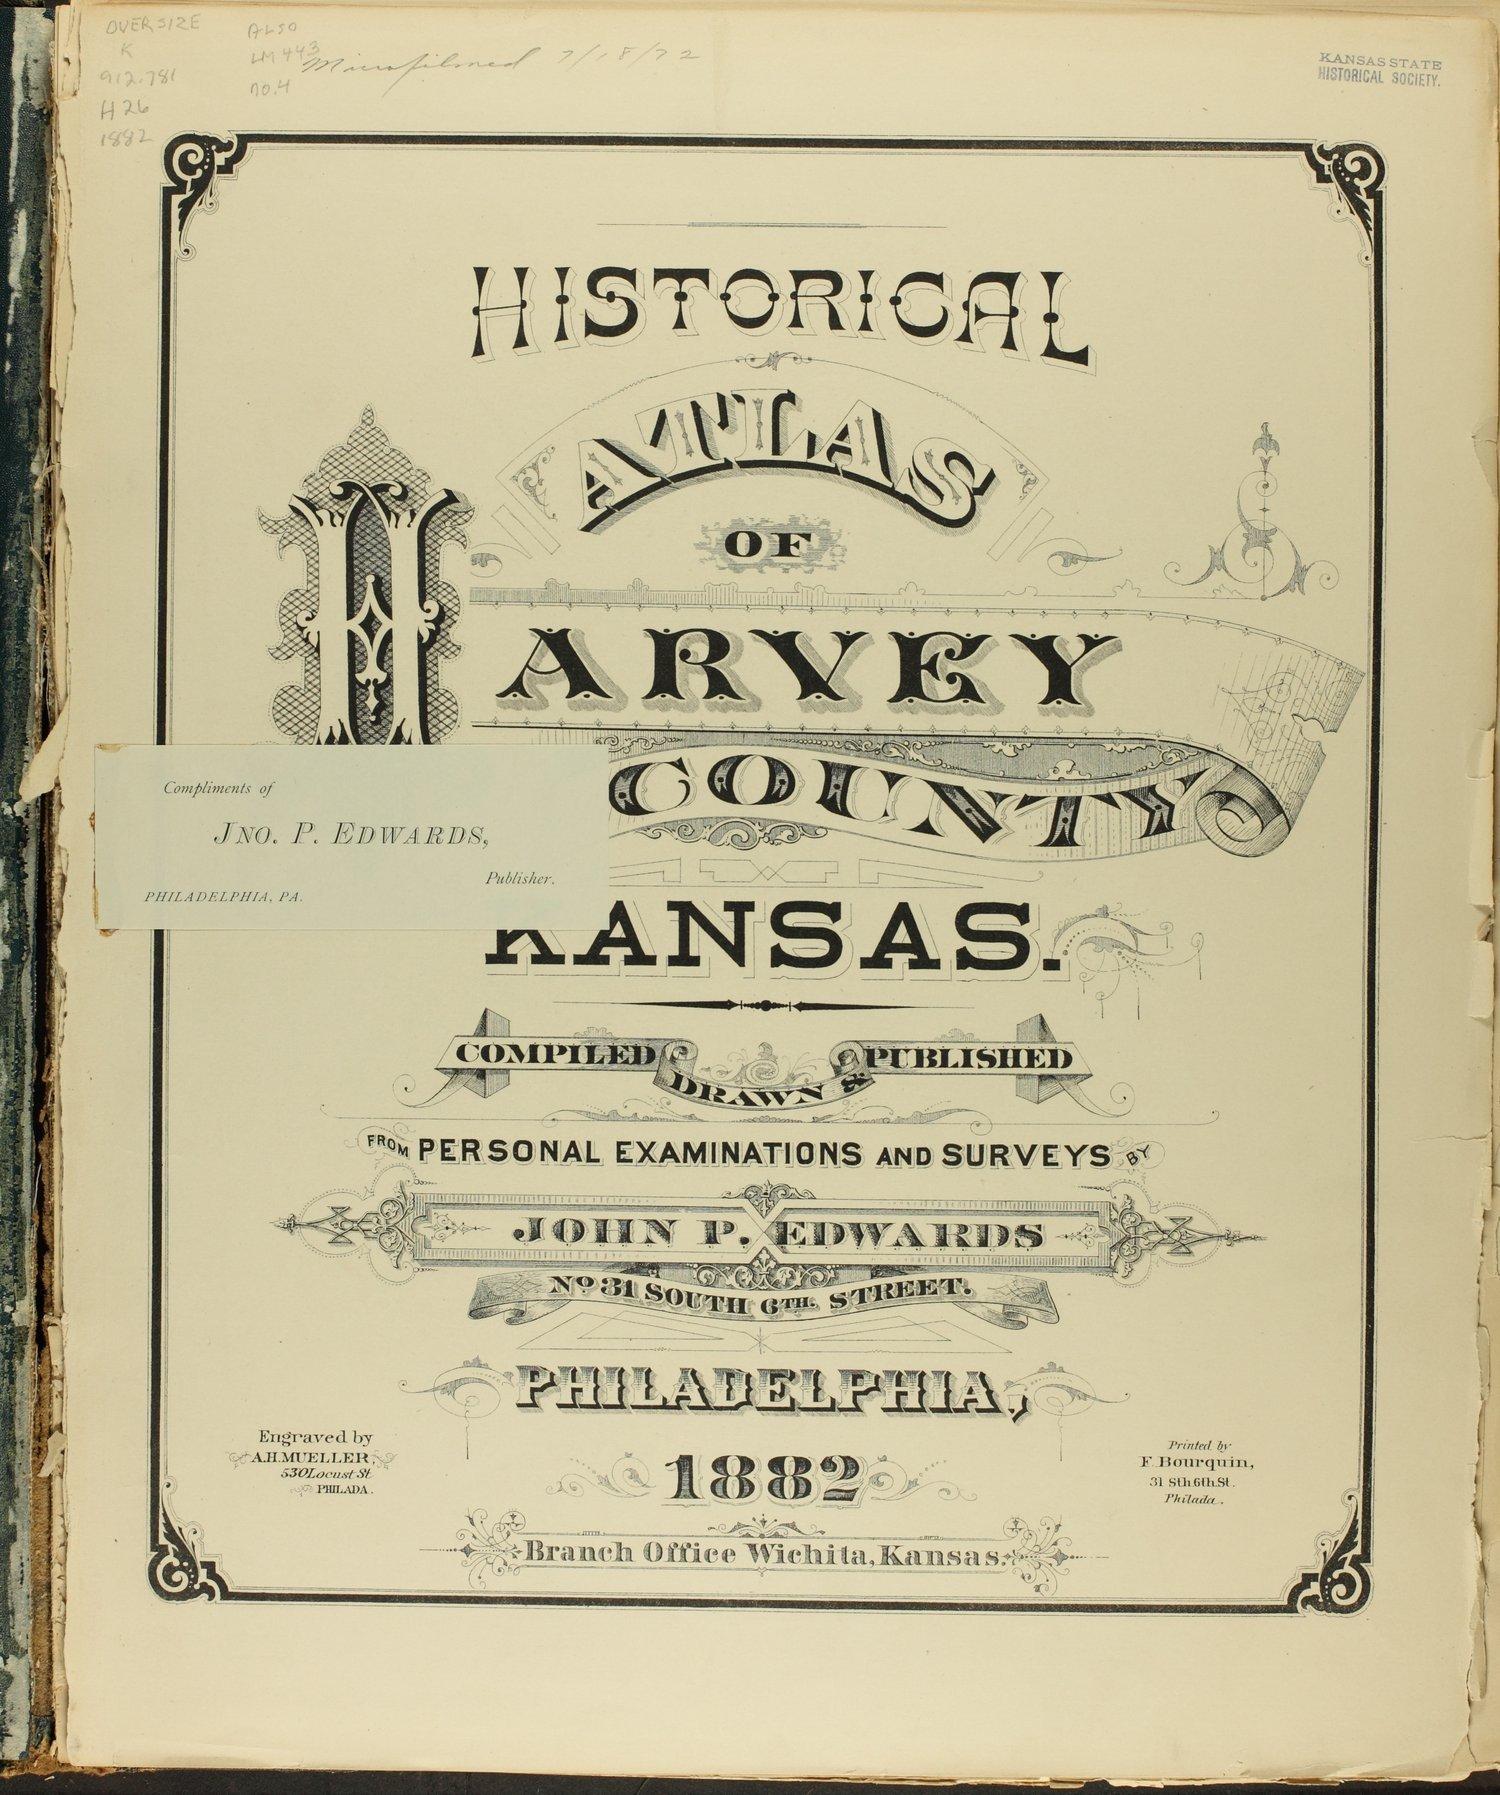 Historical atlas of Harvey County, Kansas - insert